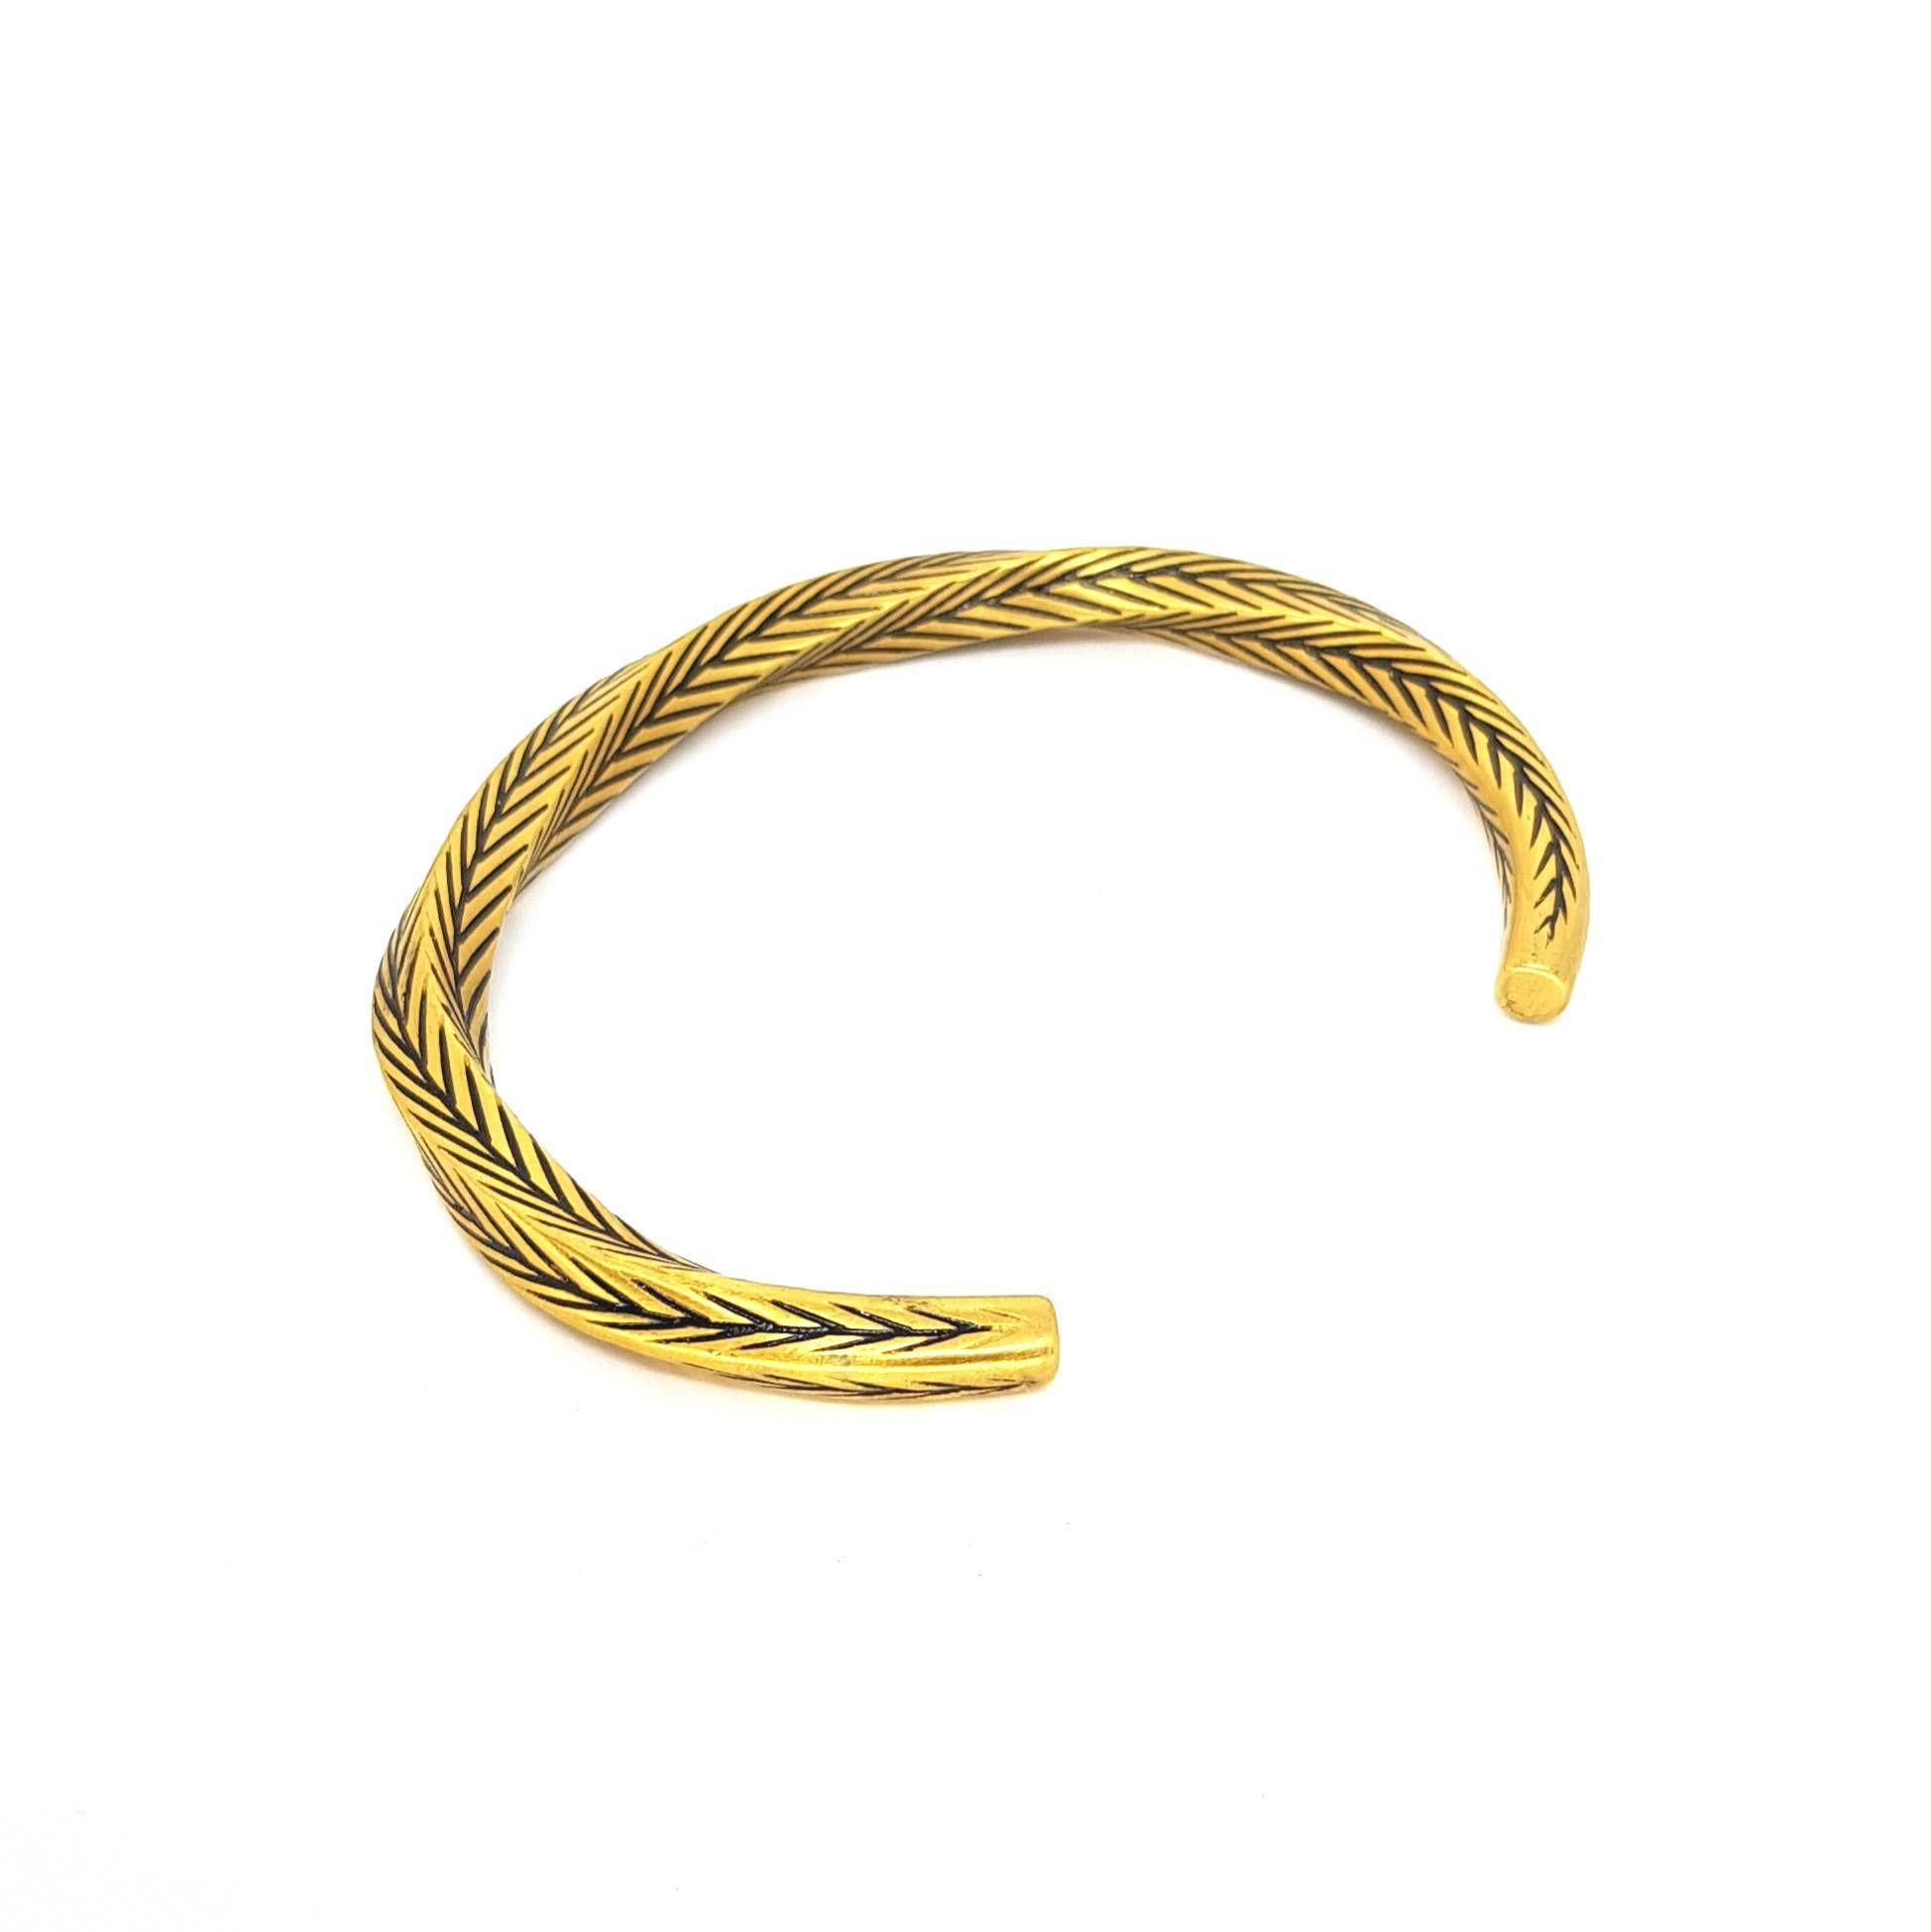 Pulseira Aço Inox Old Gold